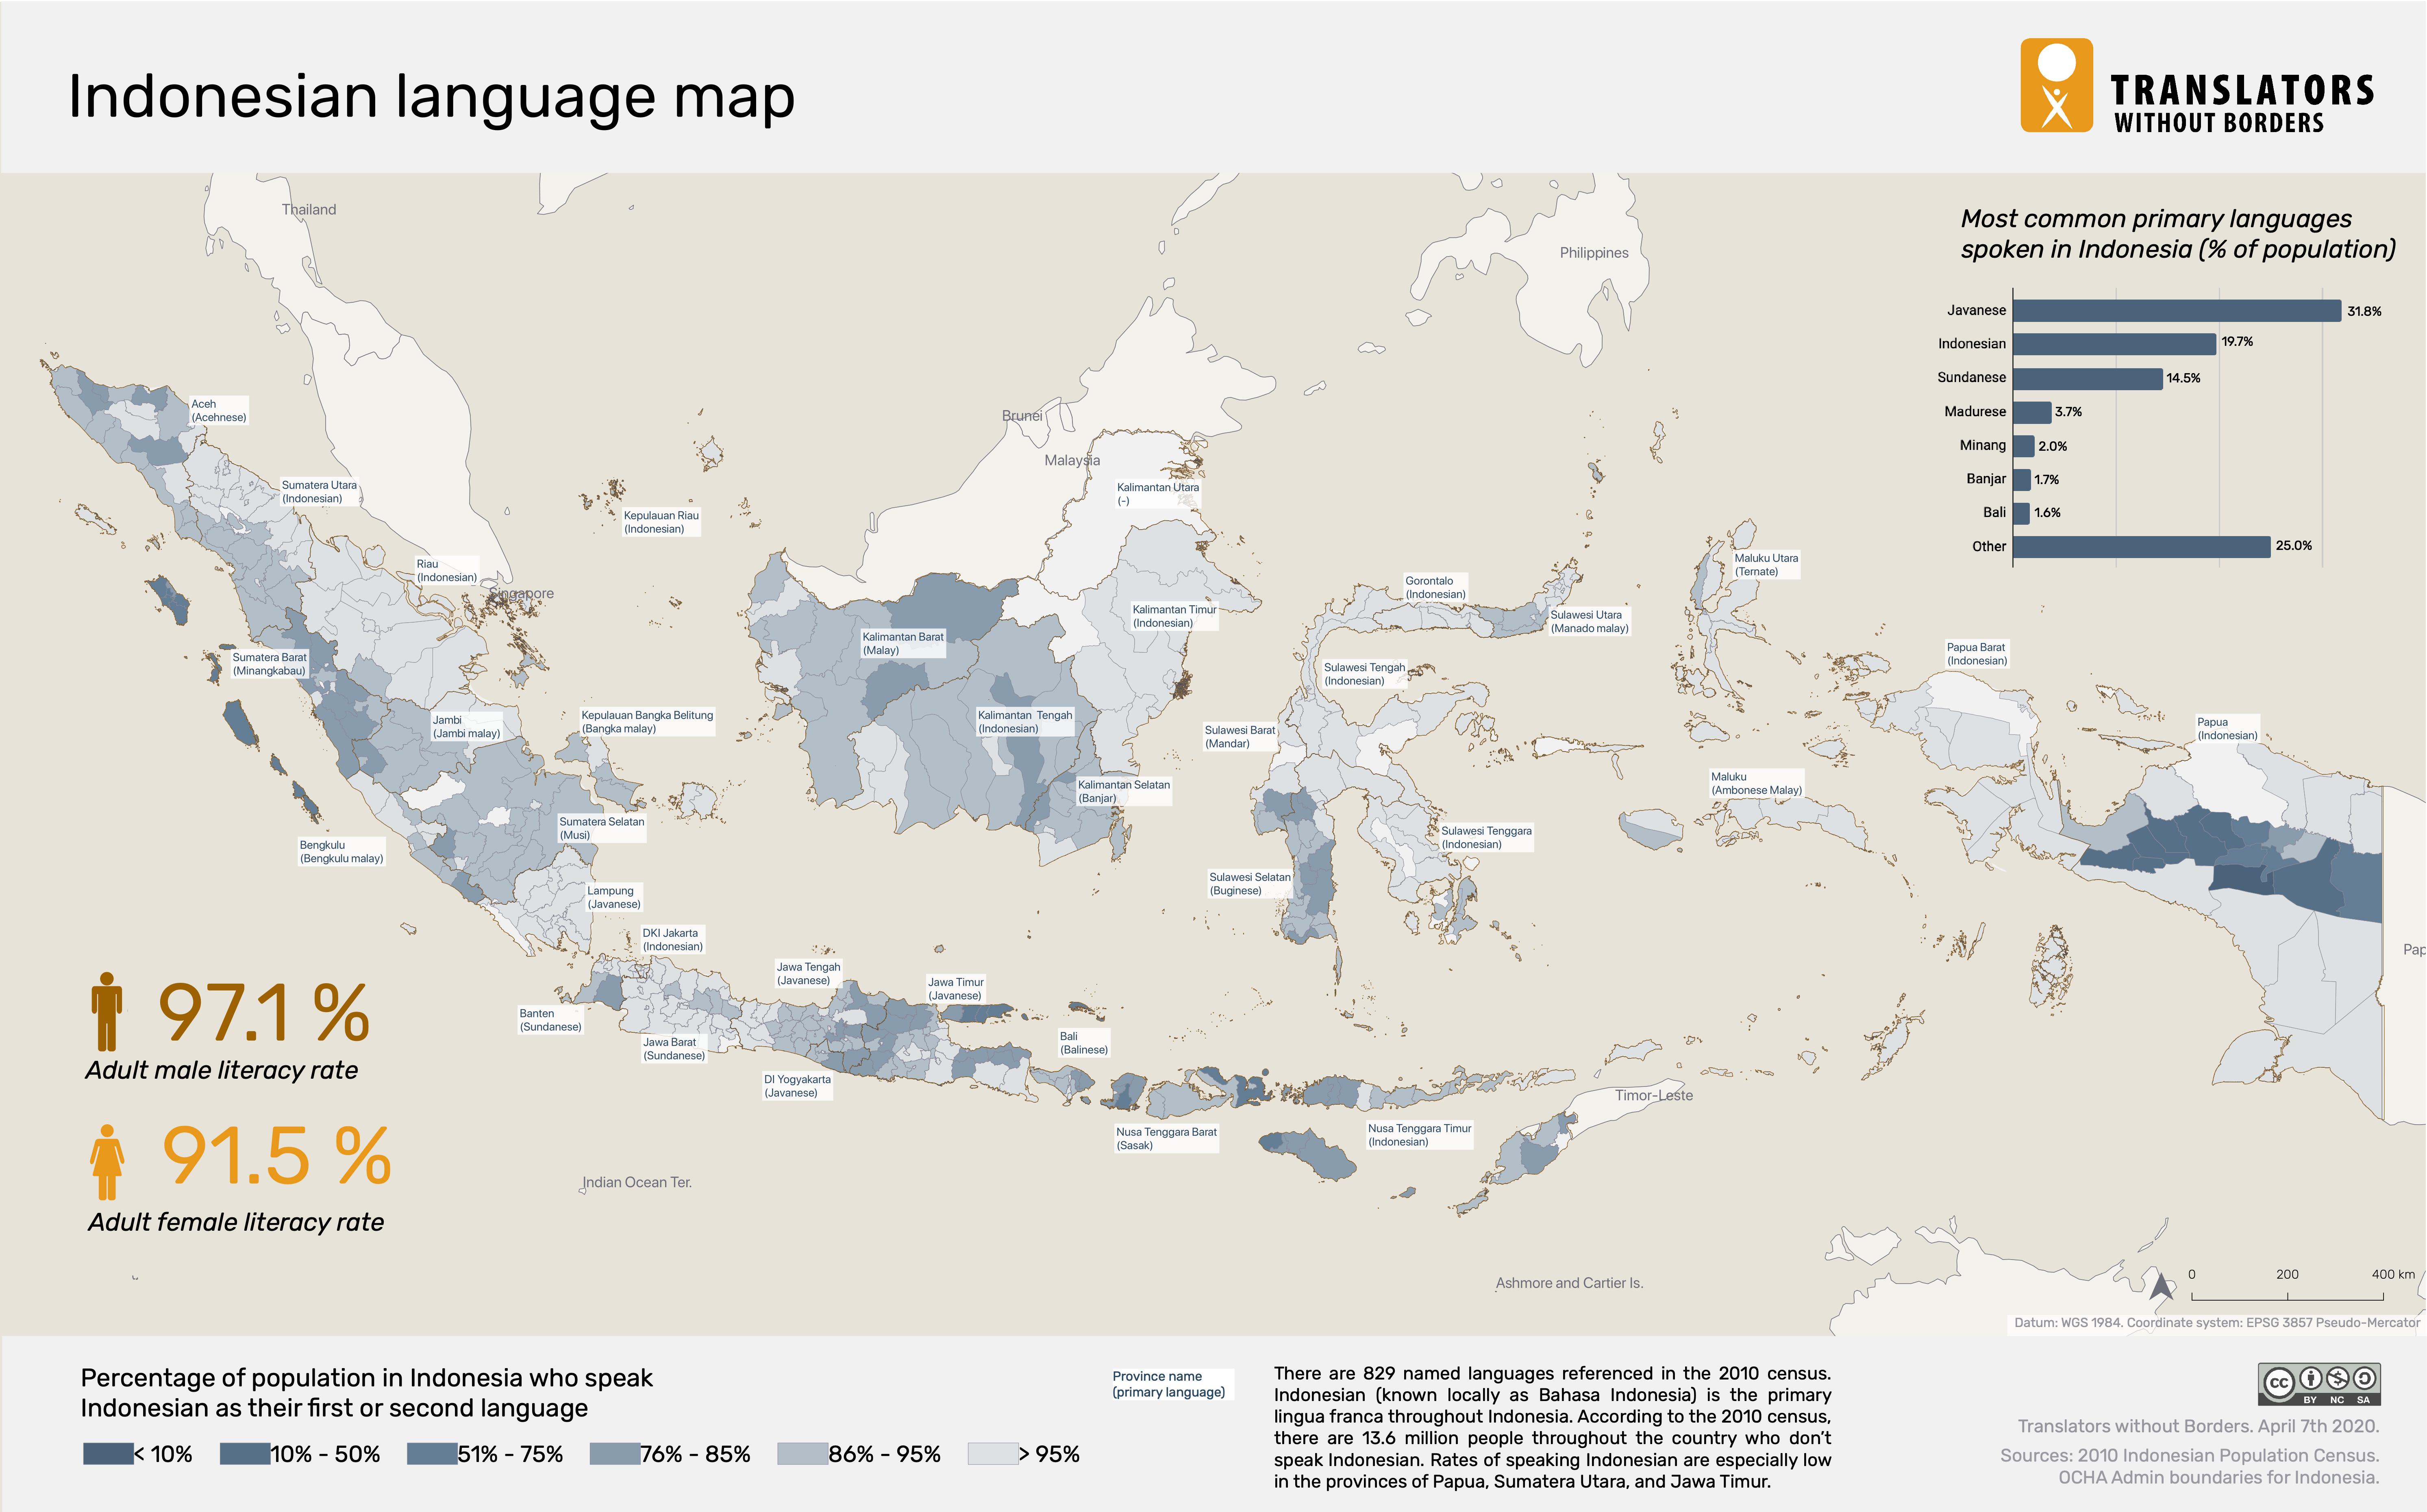 Language Data For Indonesia Translators Without Borders